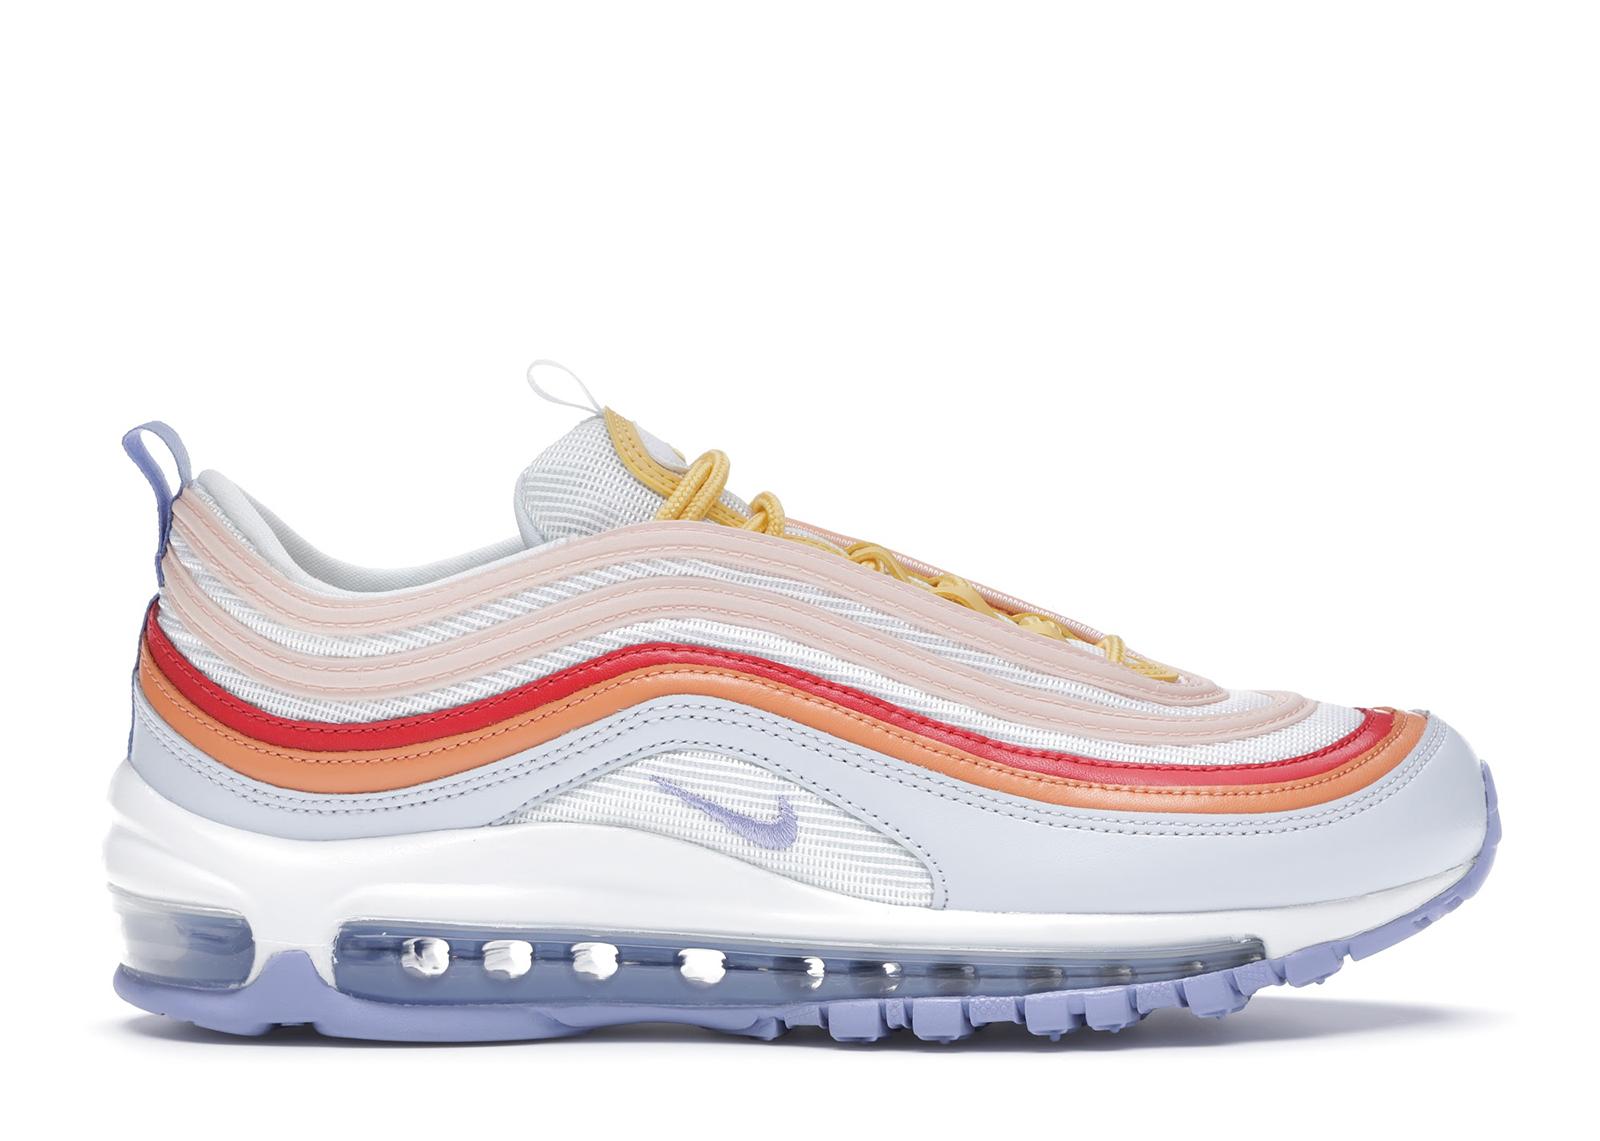 Buy Nike Air Max 97 Shoes & Deadstock Sneakers